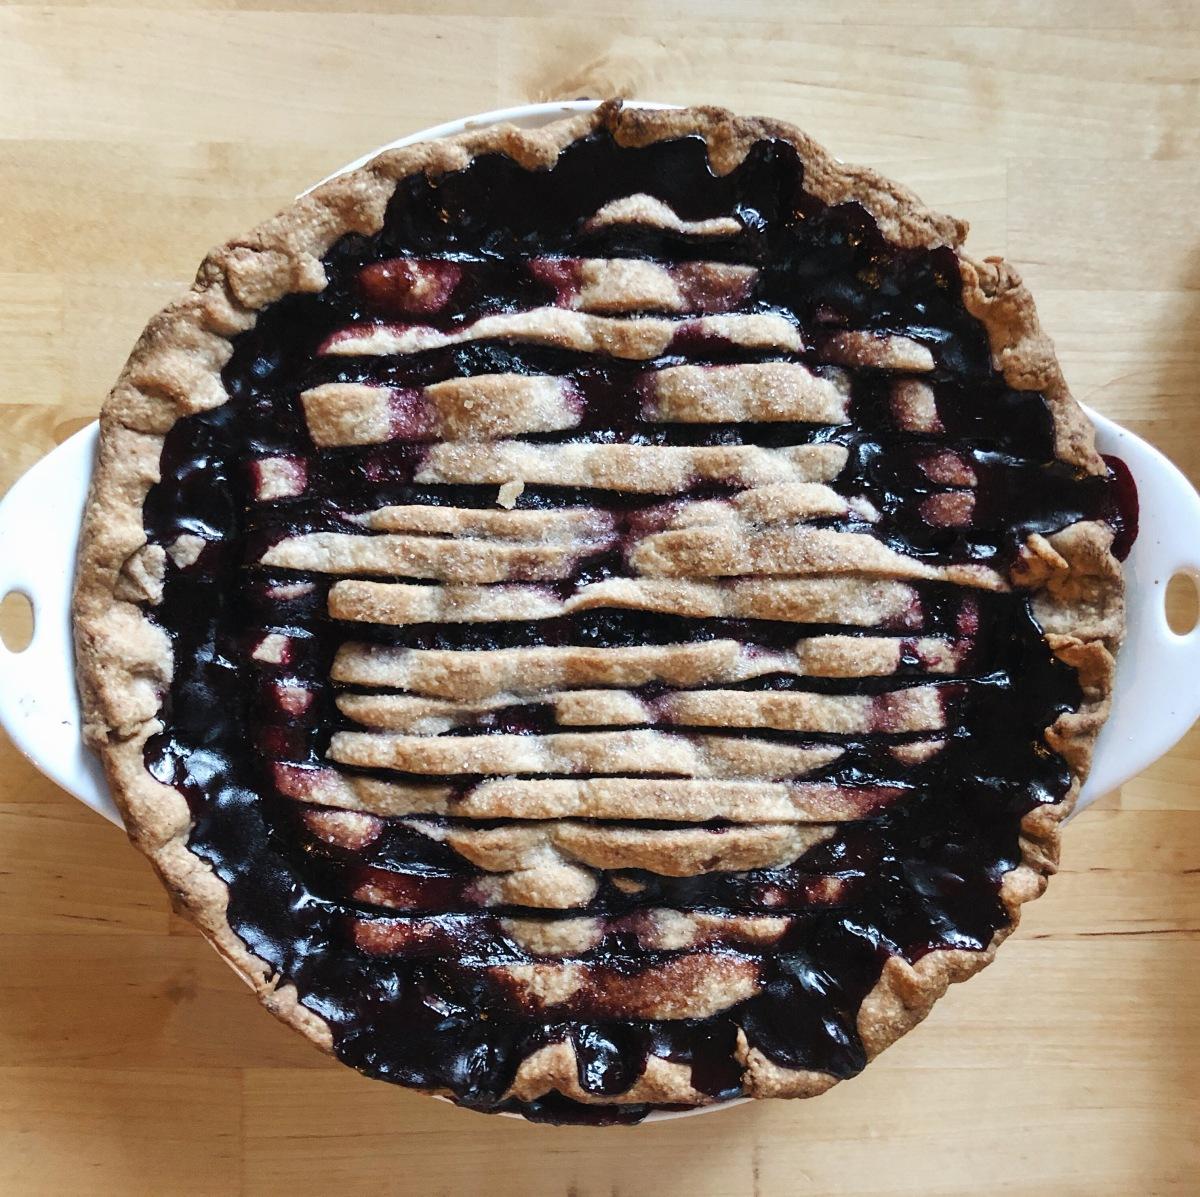 blackberry pie from sweetrevengepdx